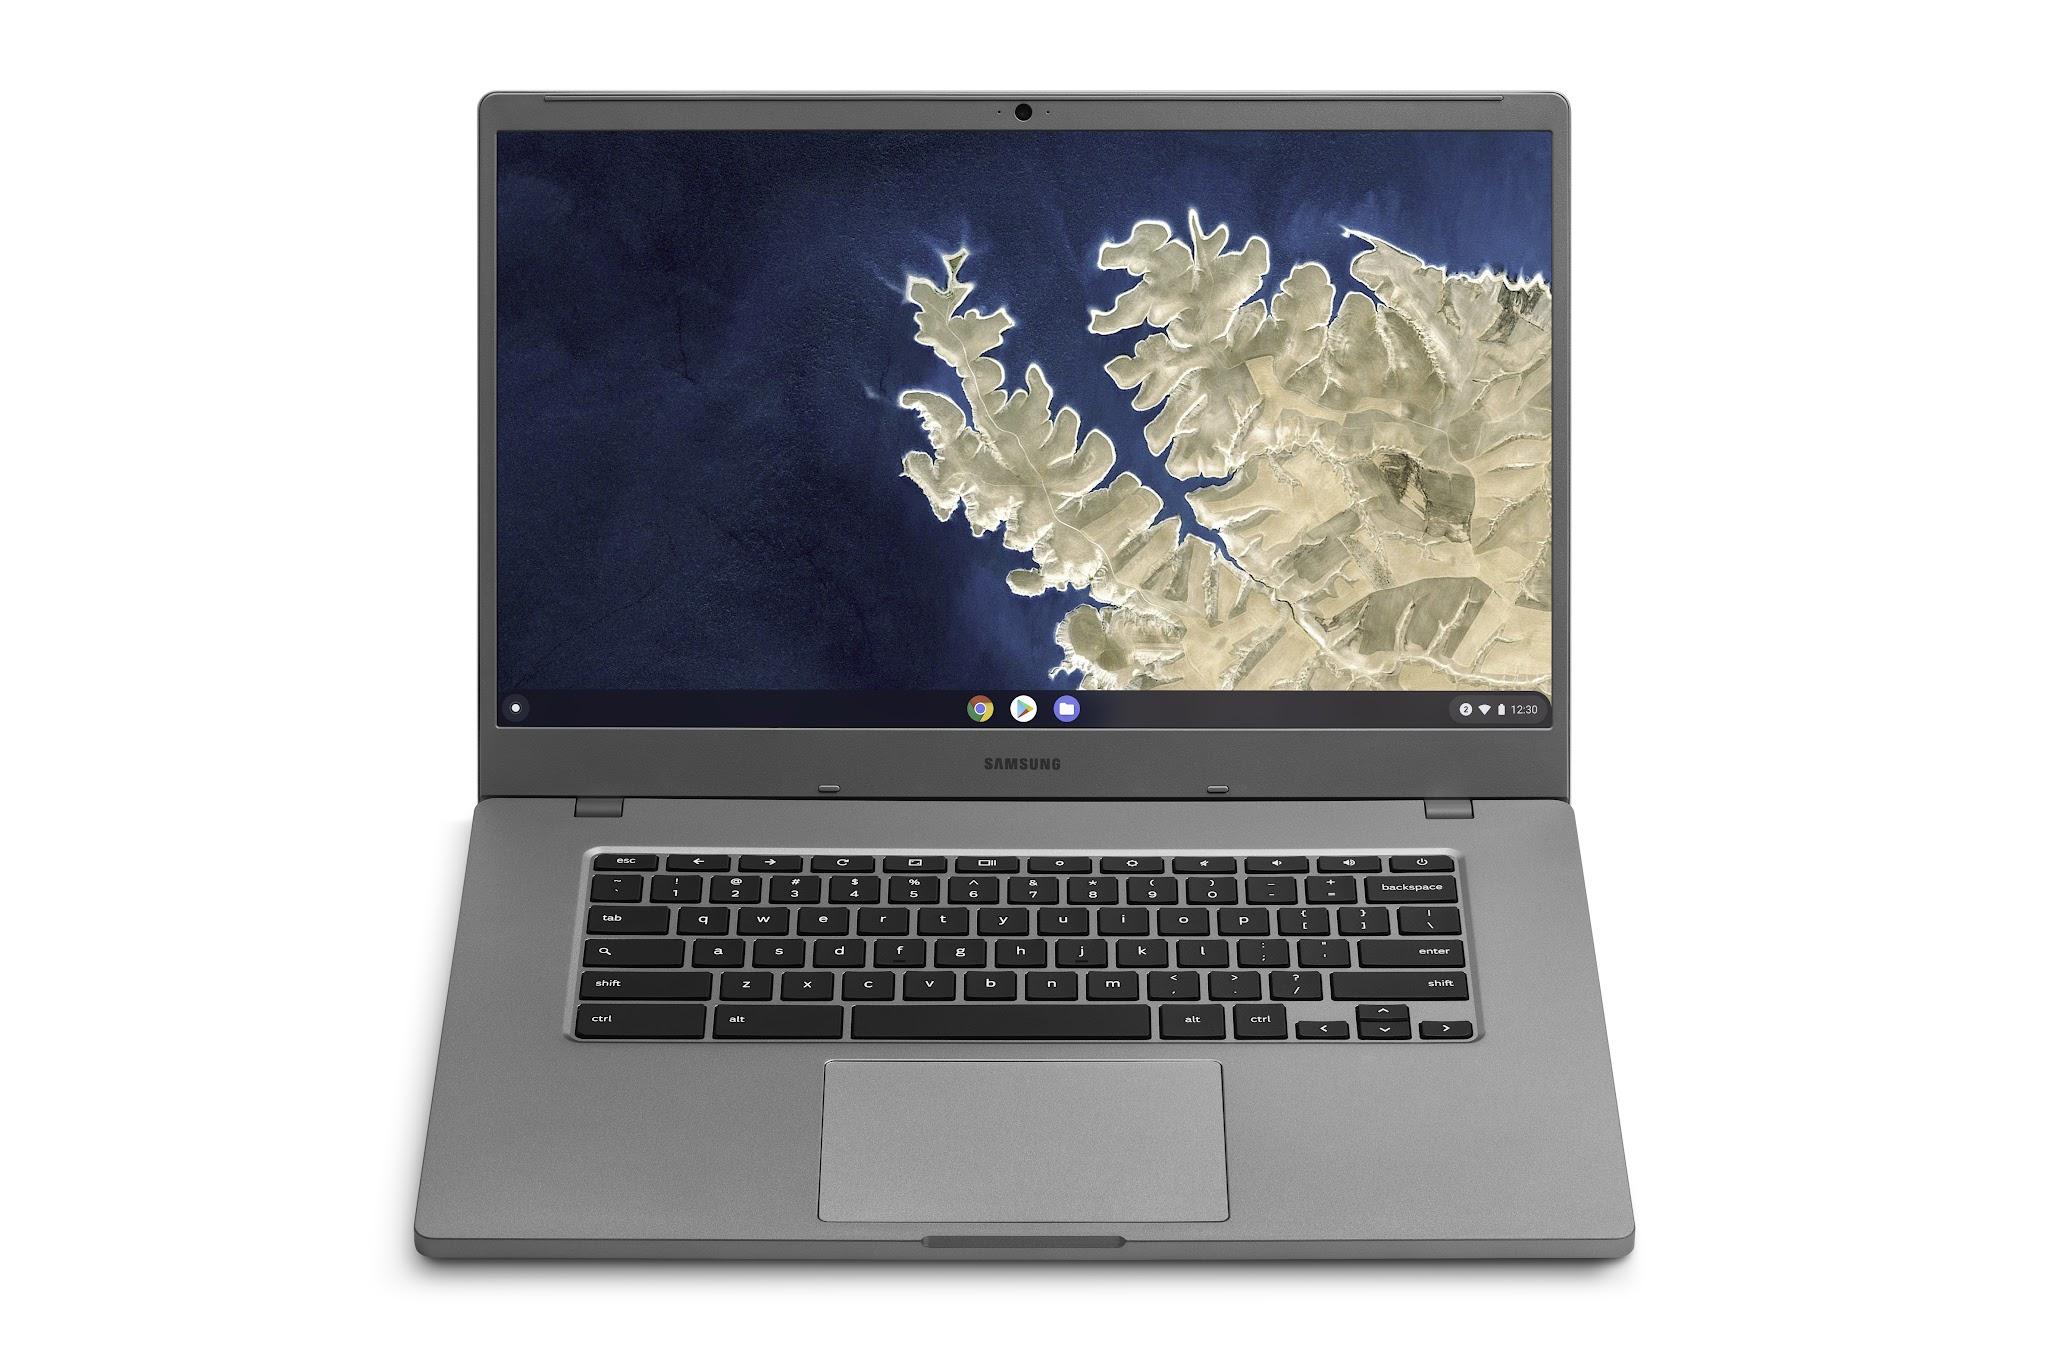 Samsung Chromebook 4+ - photo 2